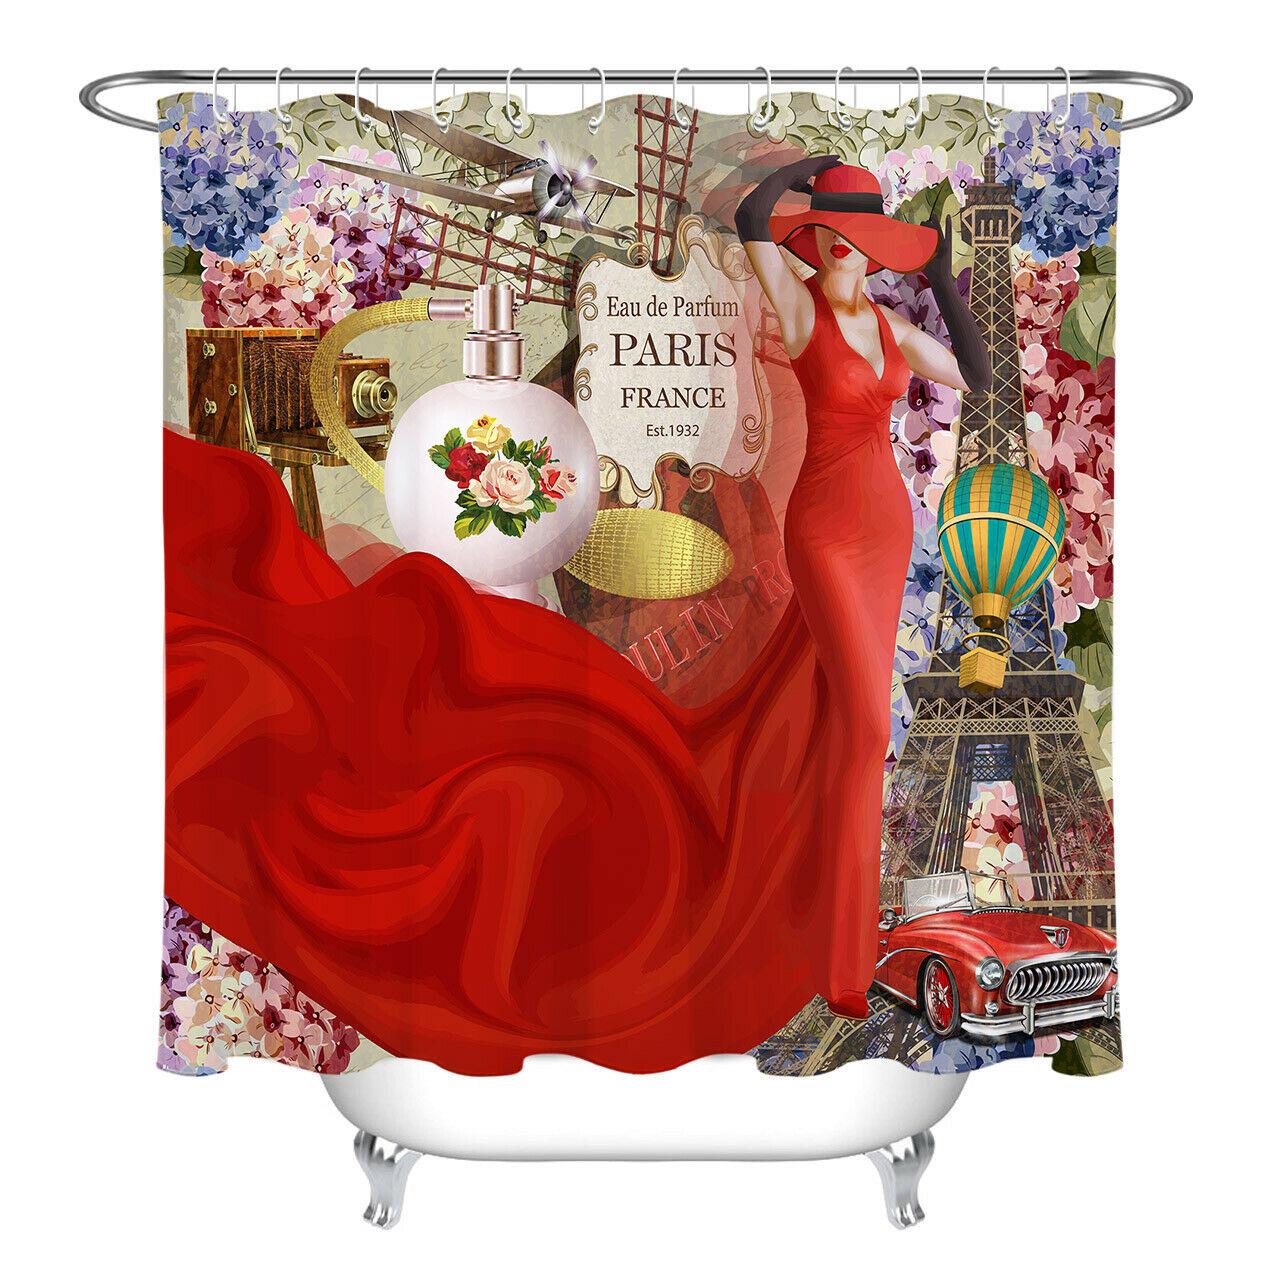 Shower Curtain Set Fashion Paris Red Skirt Girl Waterproof Bathroom Rug w// Hooks